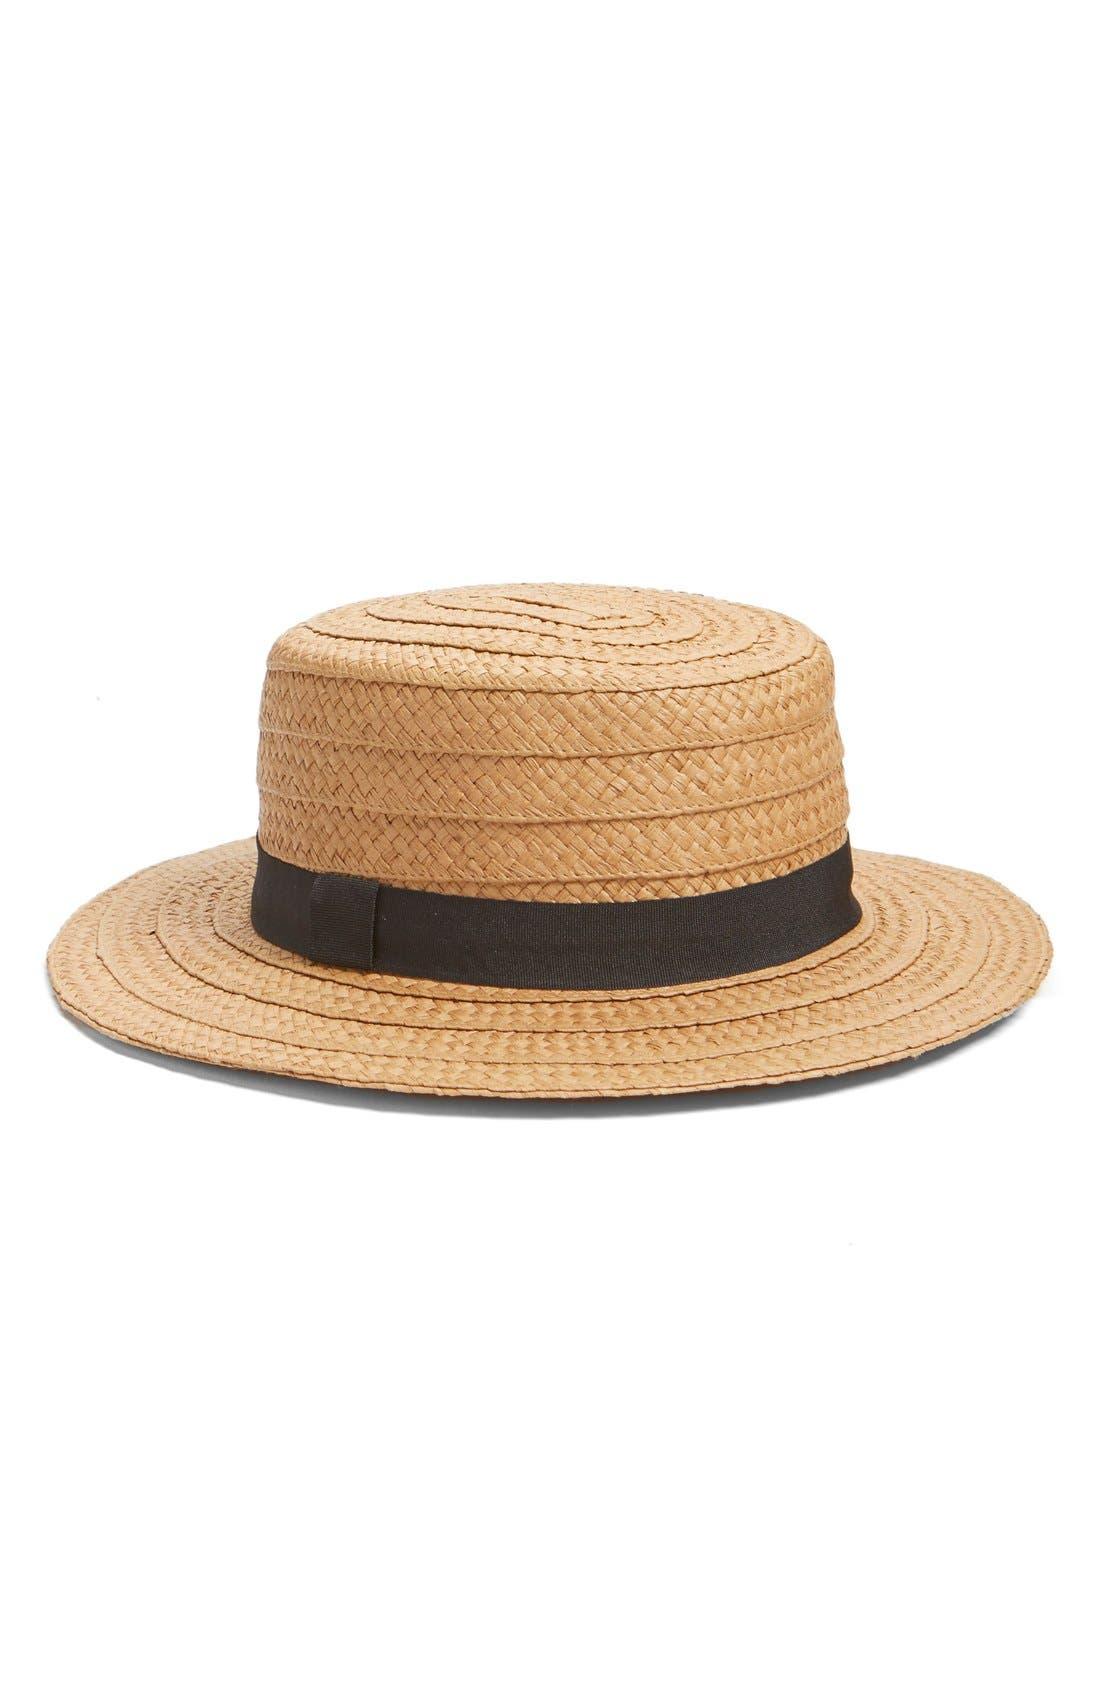 Hinge Straw Boater Hat